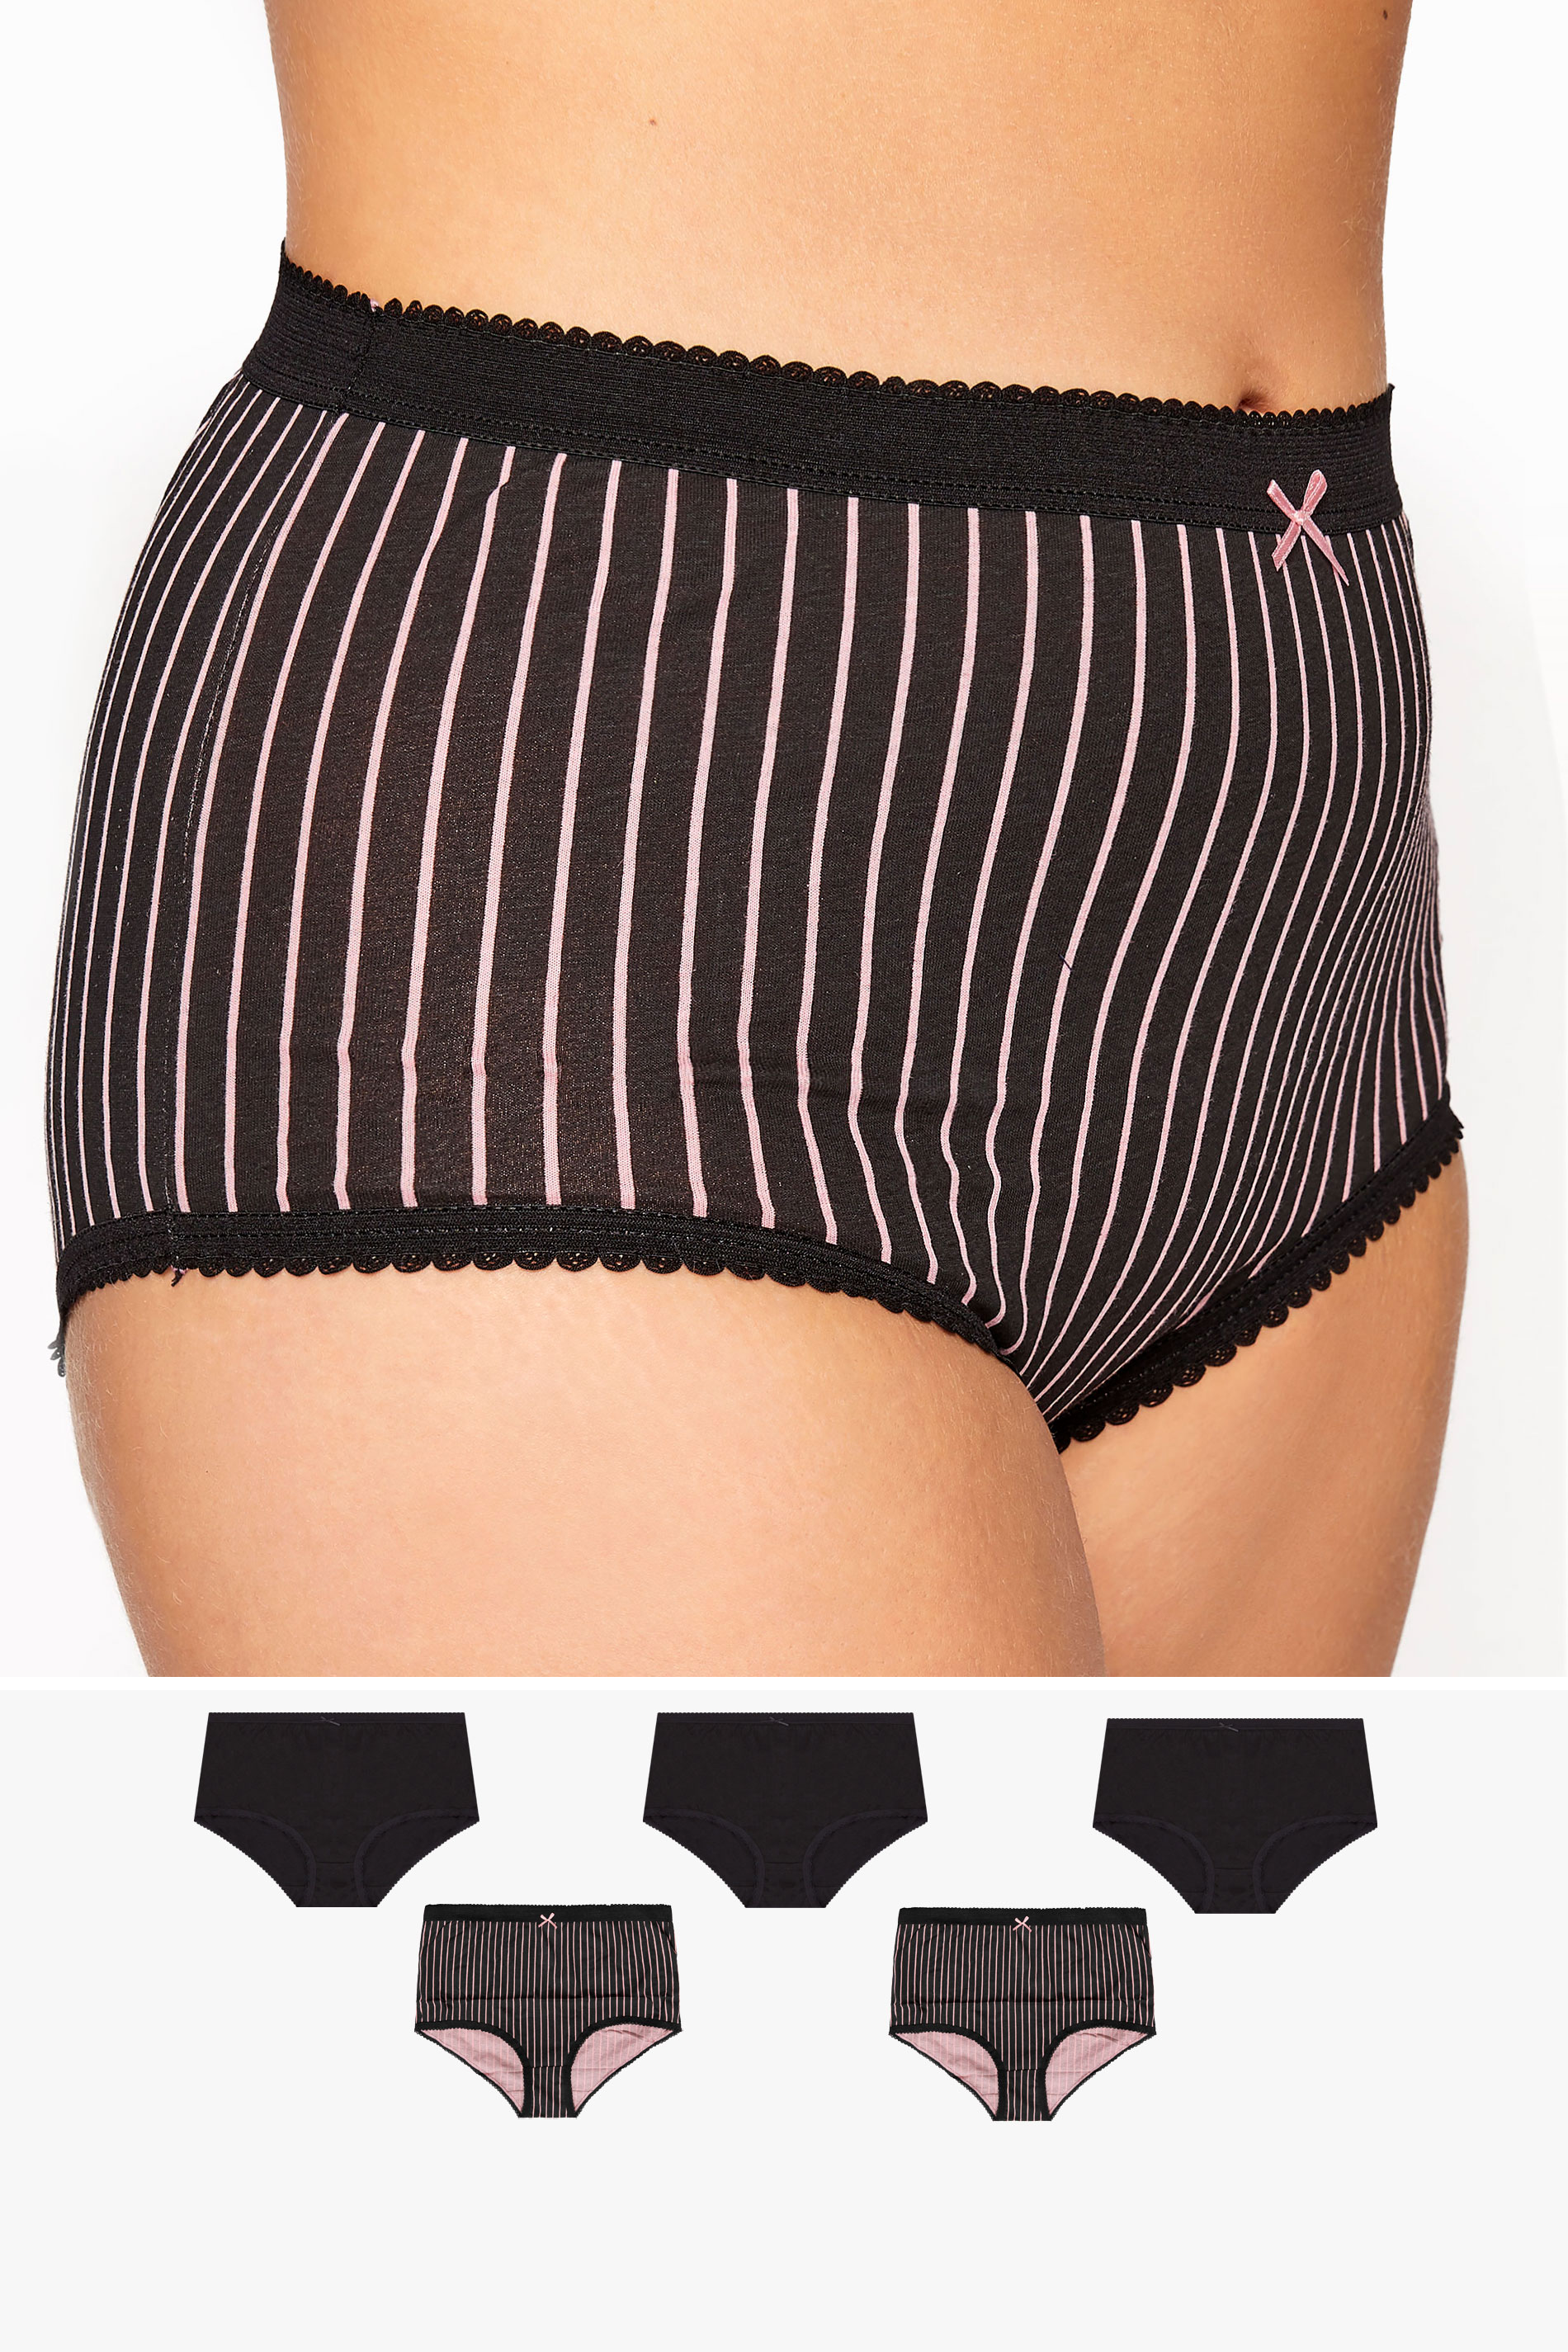 5 PACK Black & Pink Stripe Lace Full Briefs_split.jpg